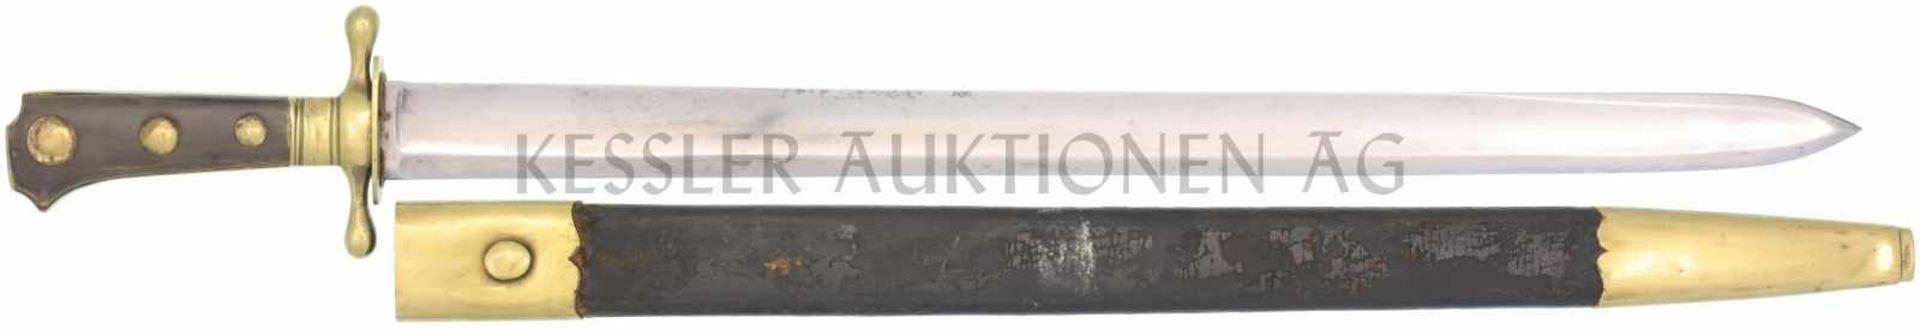 Waidmesser, Kt. VD, 1837 KL 532mm, TL 660mm, Klinge mit voller Wurzel, beidseitiger Hohlschliff,